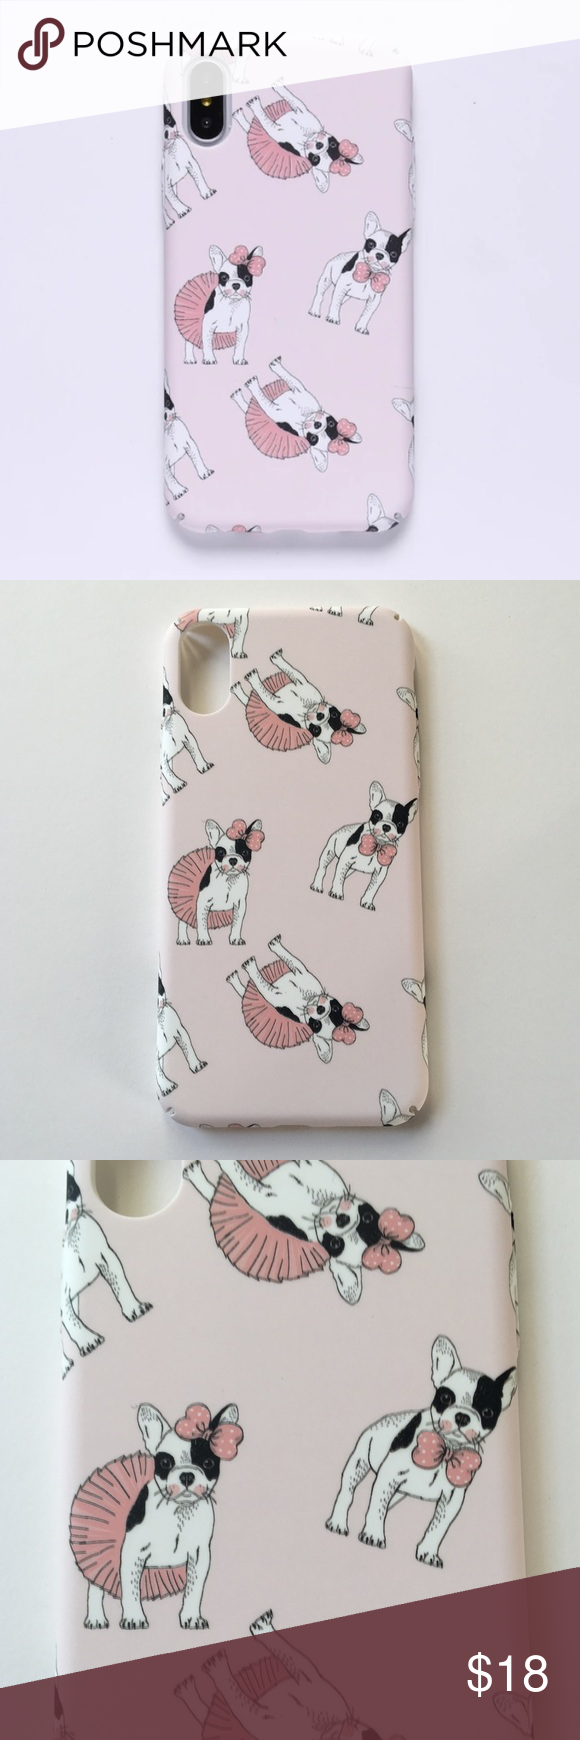 "iPhone X Case ""Pink French Tutu Bulldog / GLOWS"" Boutique"